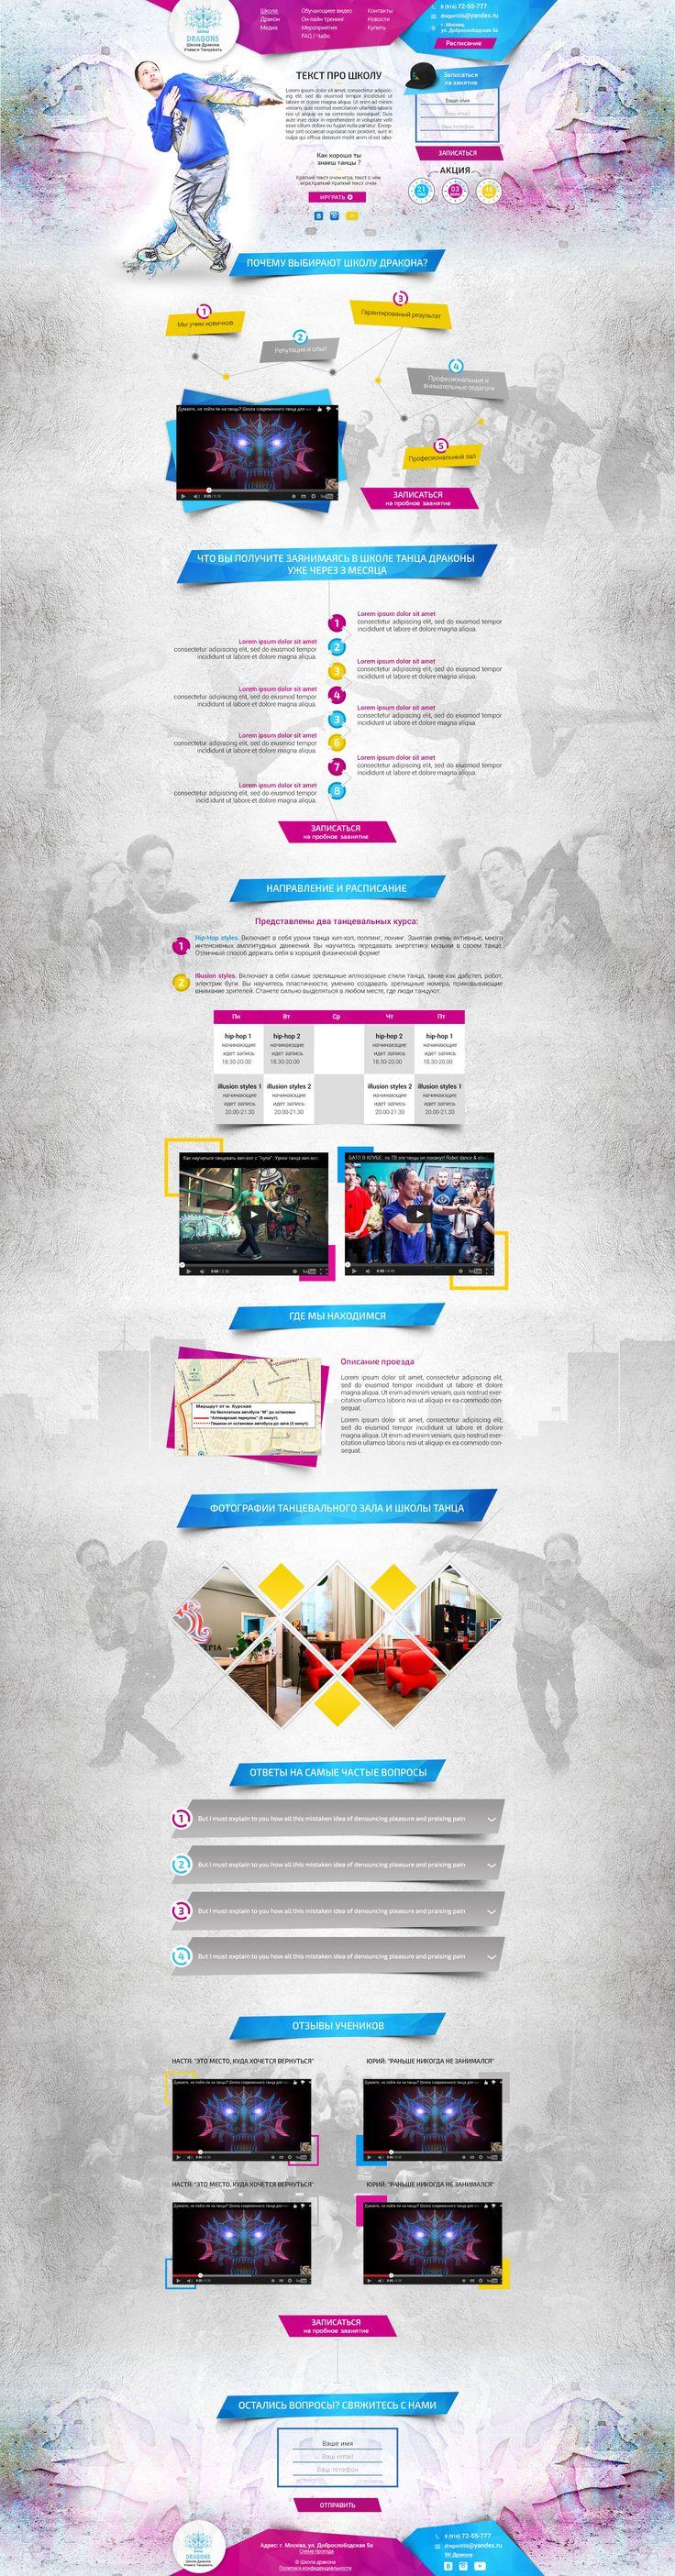 LP Dragon School — Работа №10 — Портфолио фрилансера Вадим Гринчук (Mikayan) — Weblancer.net